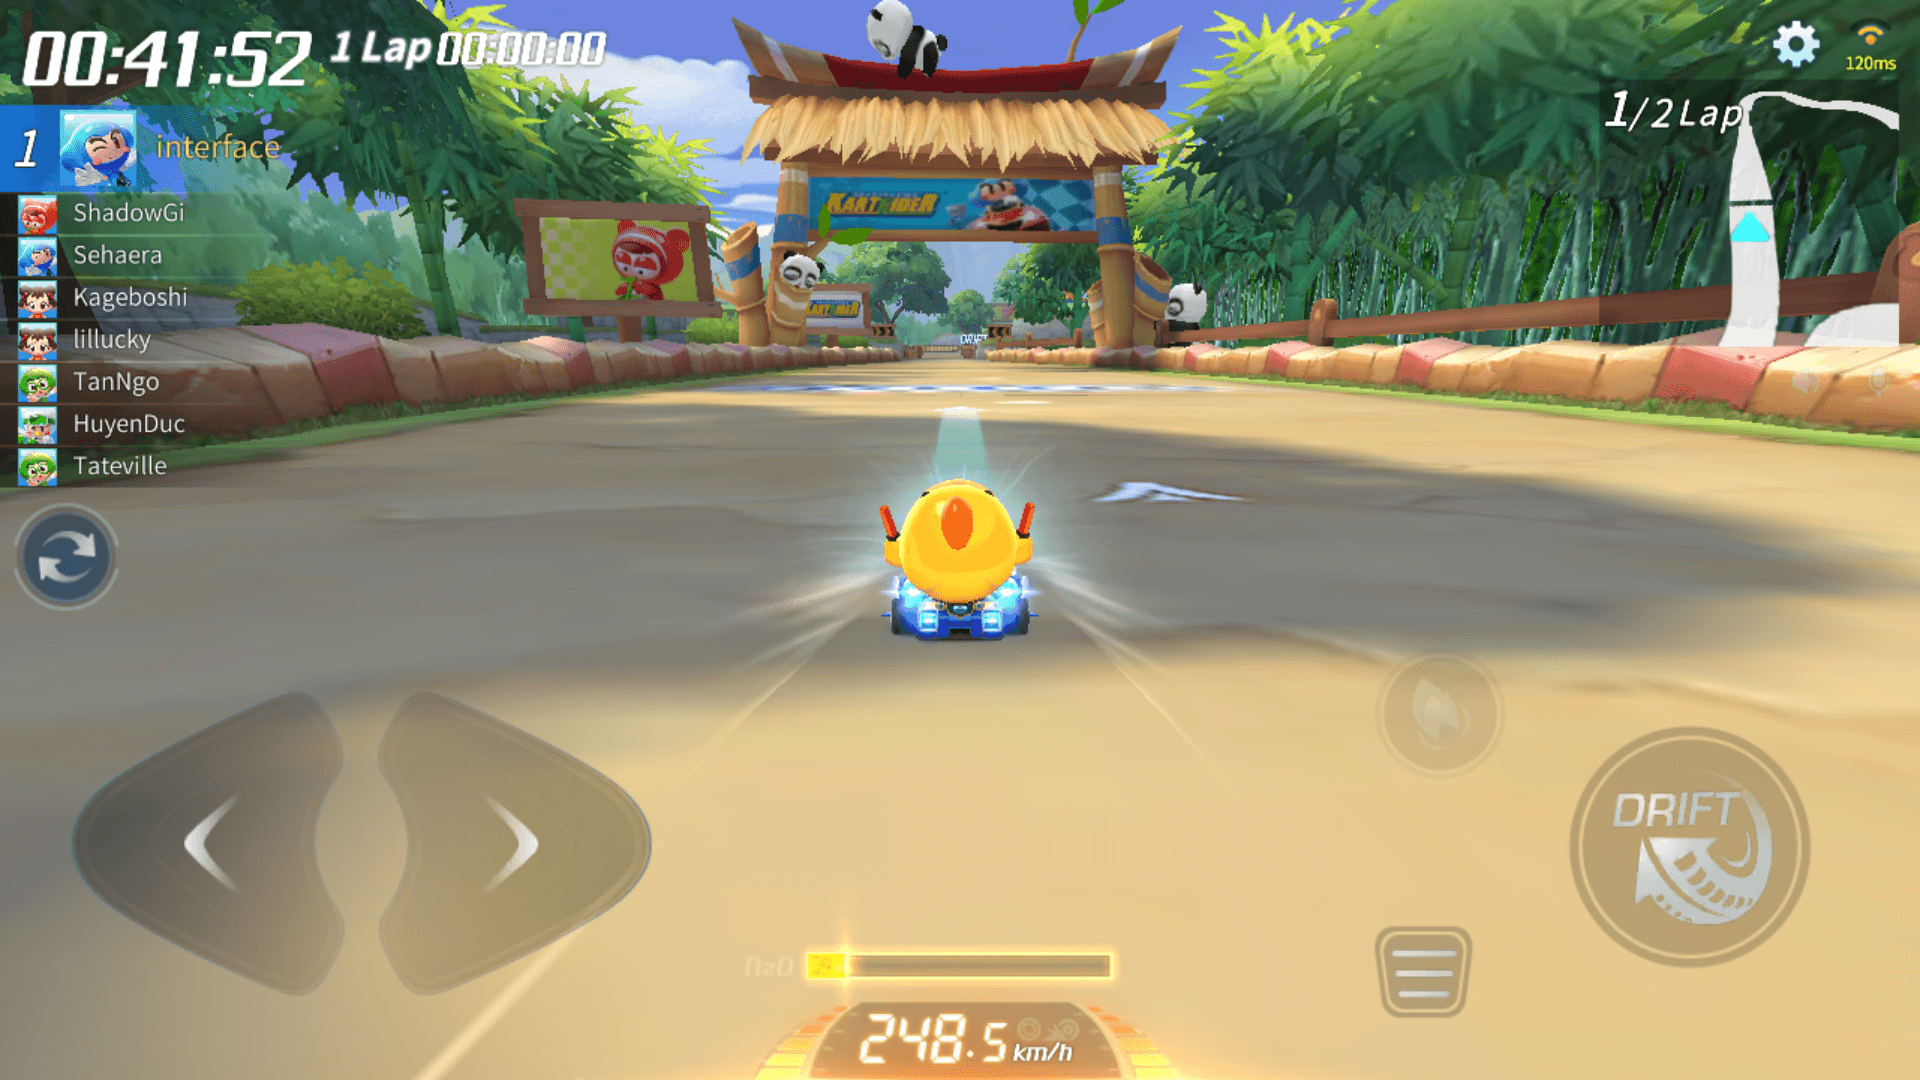 Boost screenshot of KartRider Rush+ video game interface.